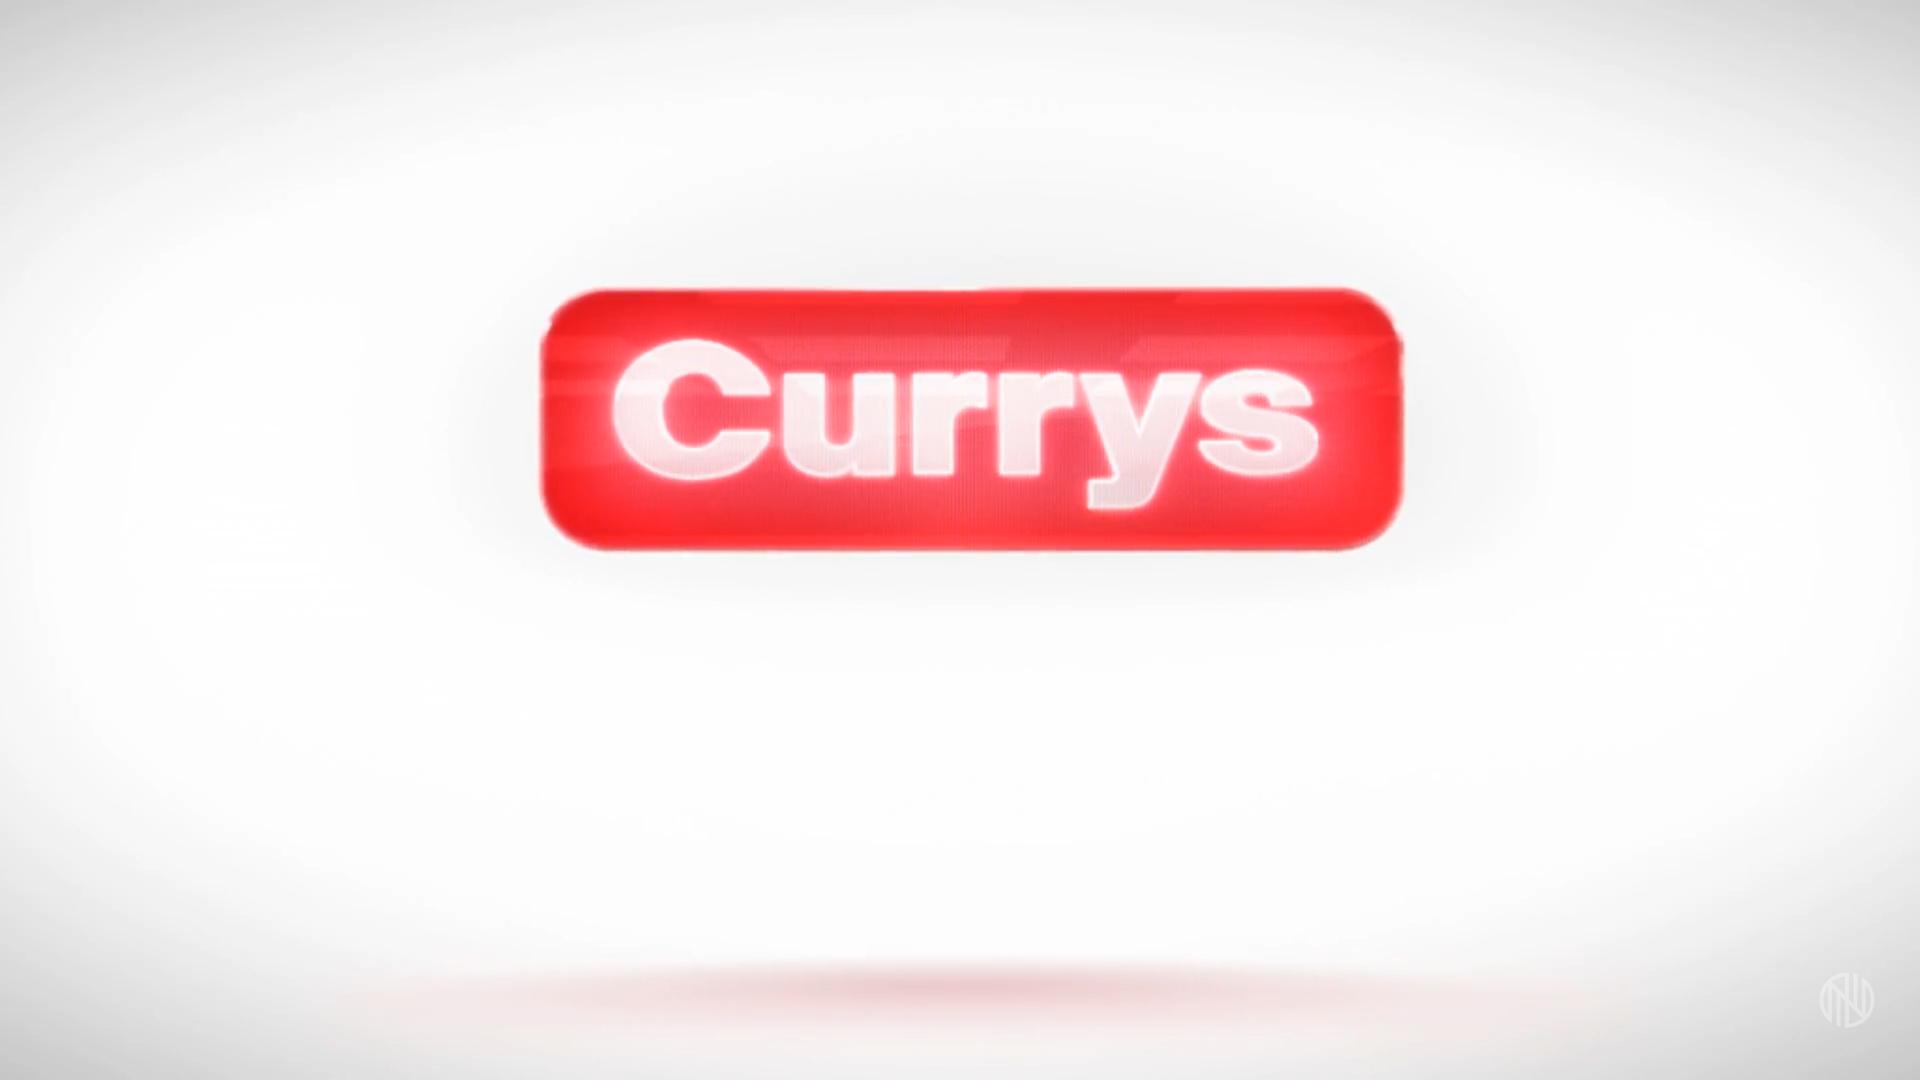 NationalTelevision_Currys HDTV-19.jpg